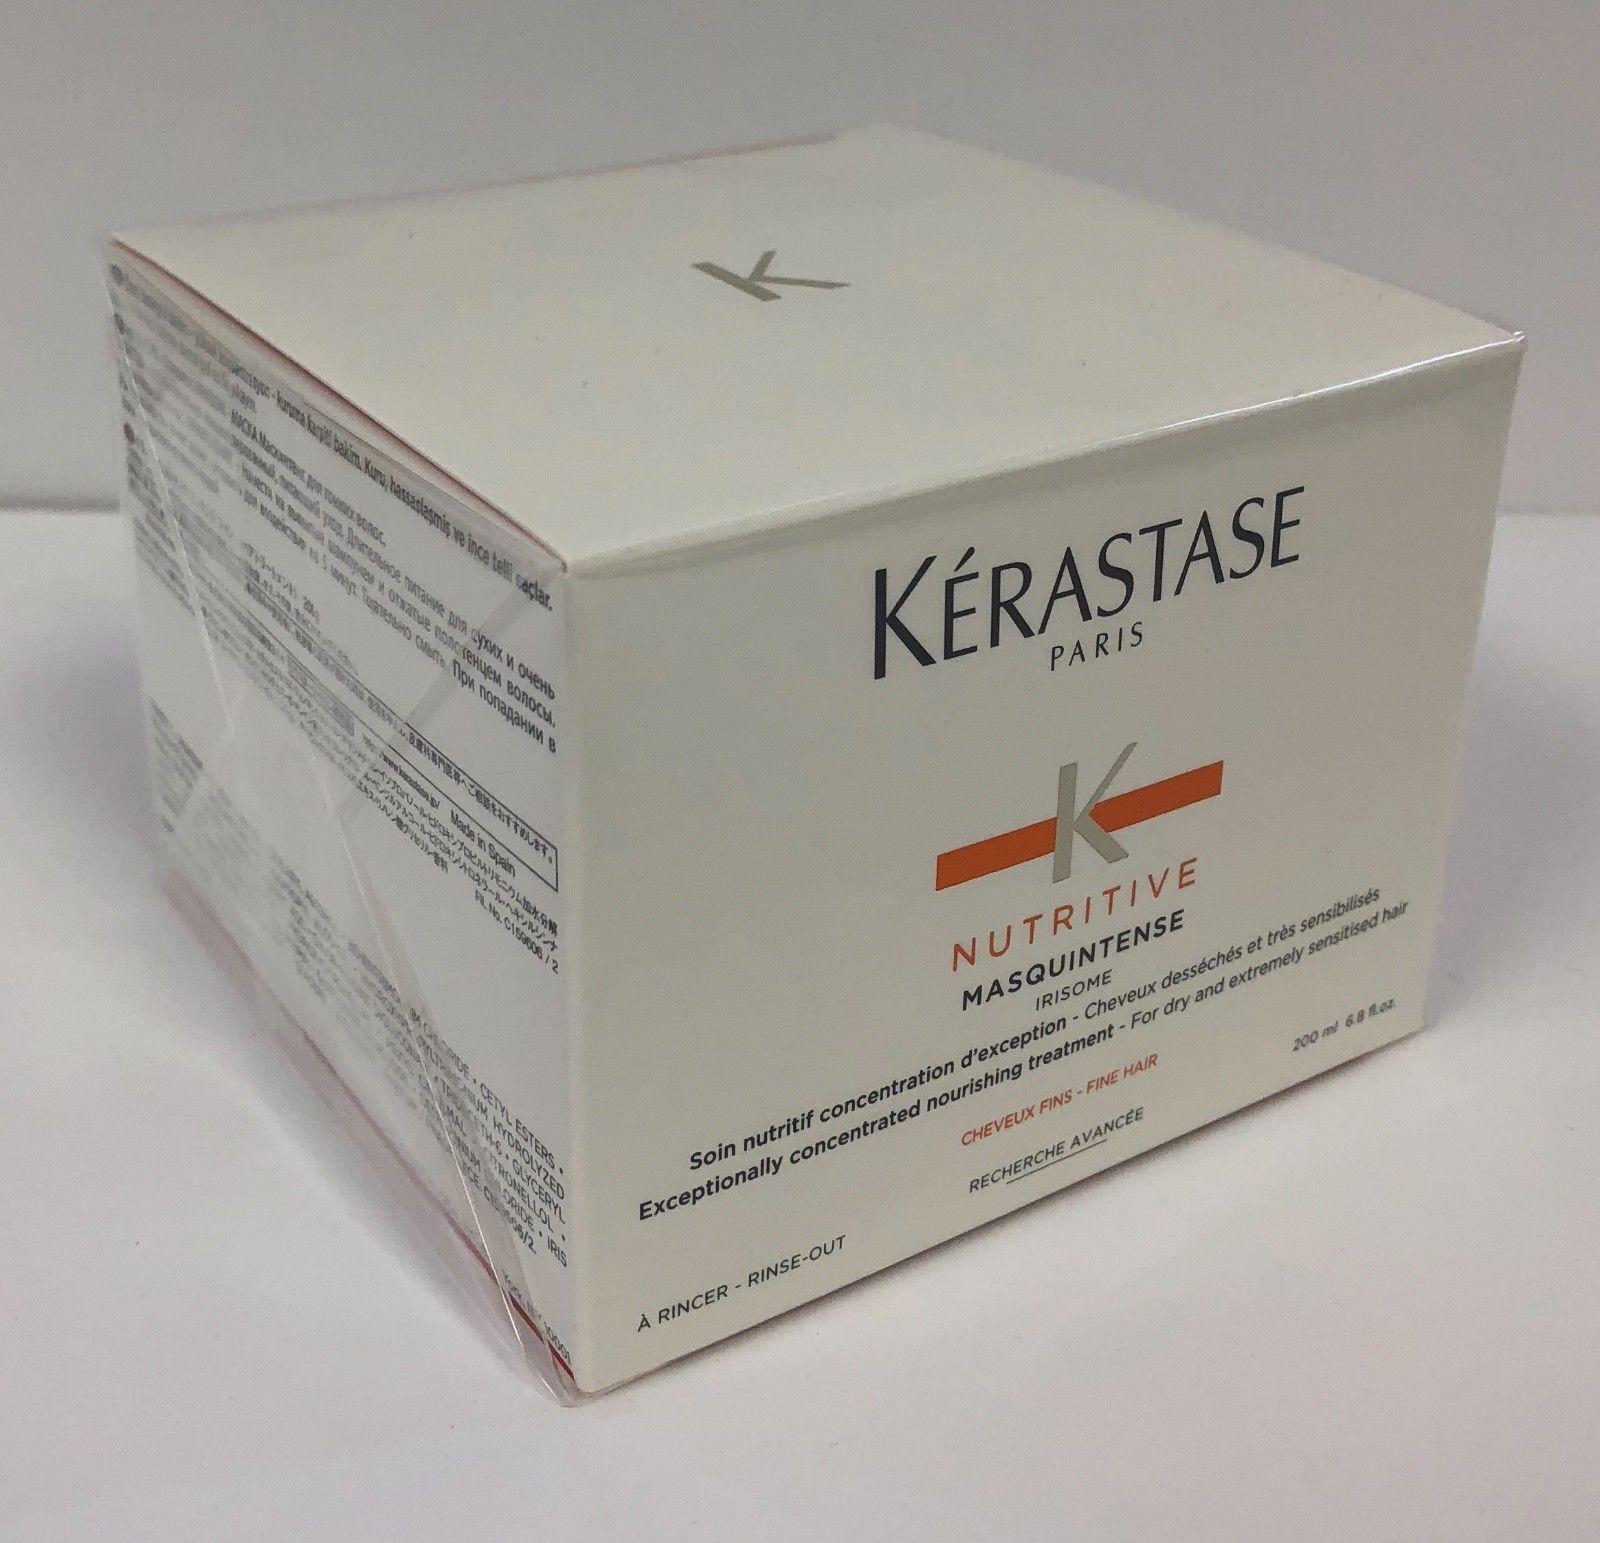 Kerastase Nutritive Masquintense Fine Hair Treatment, Rinse